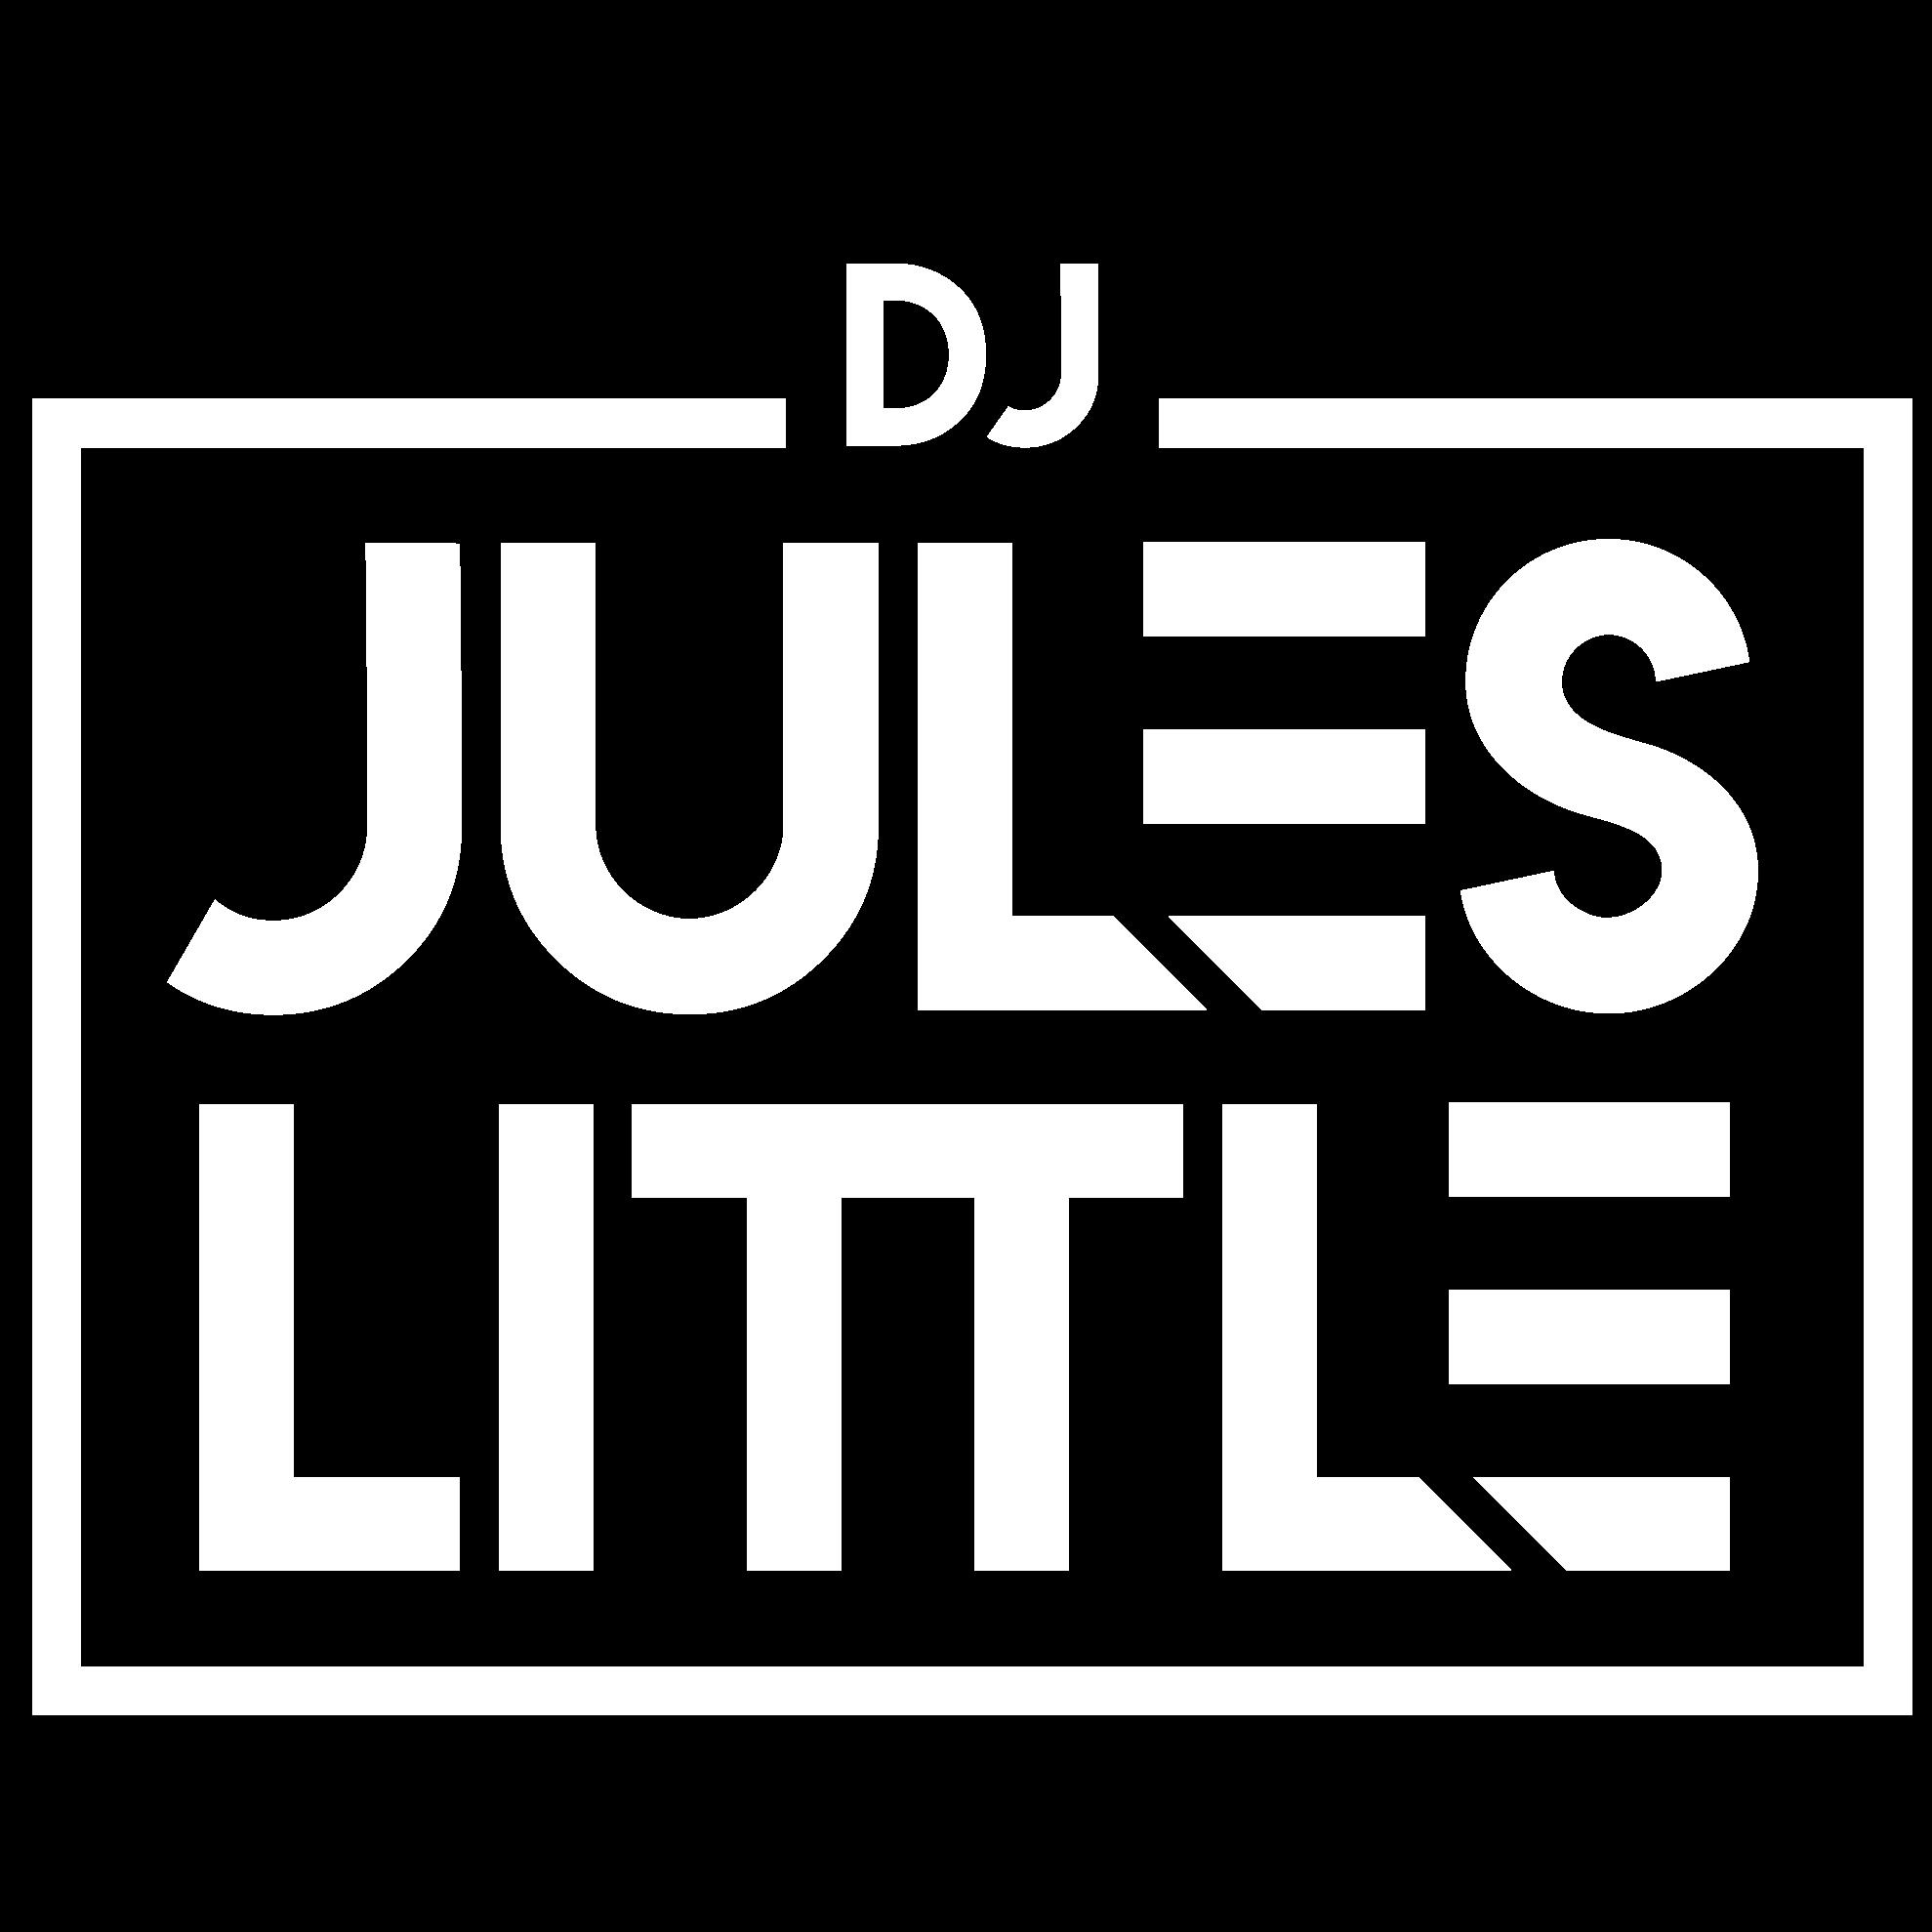 Jules Little on The MixApe